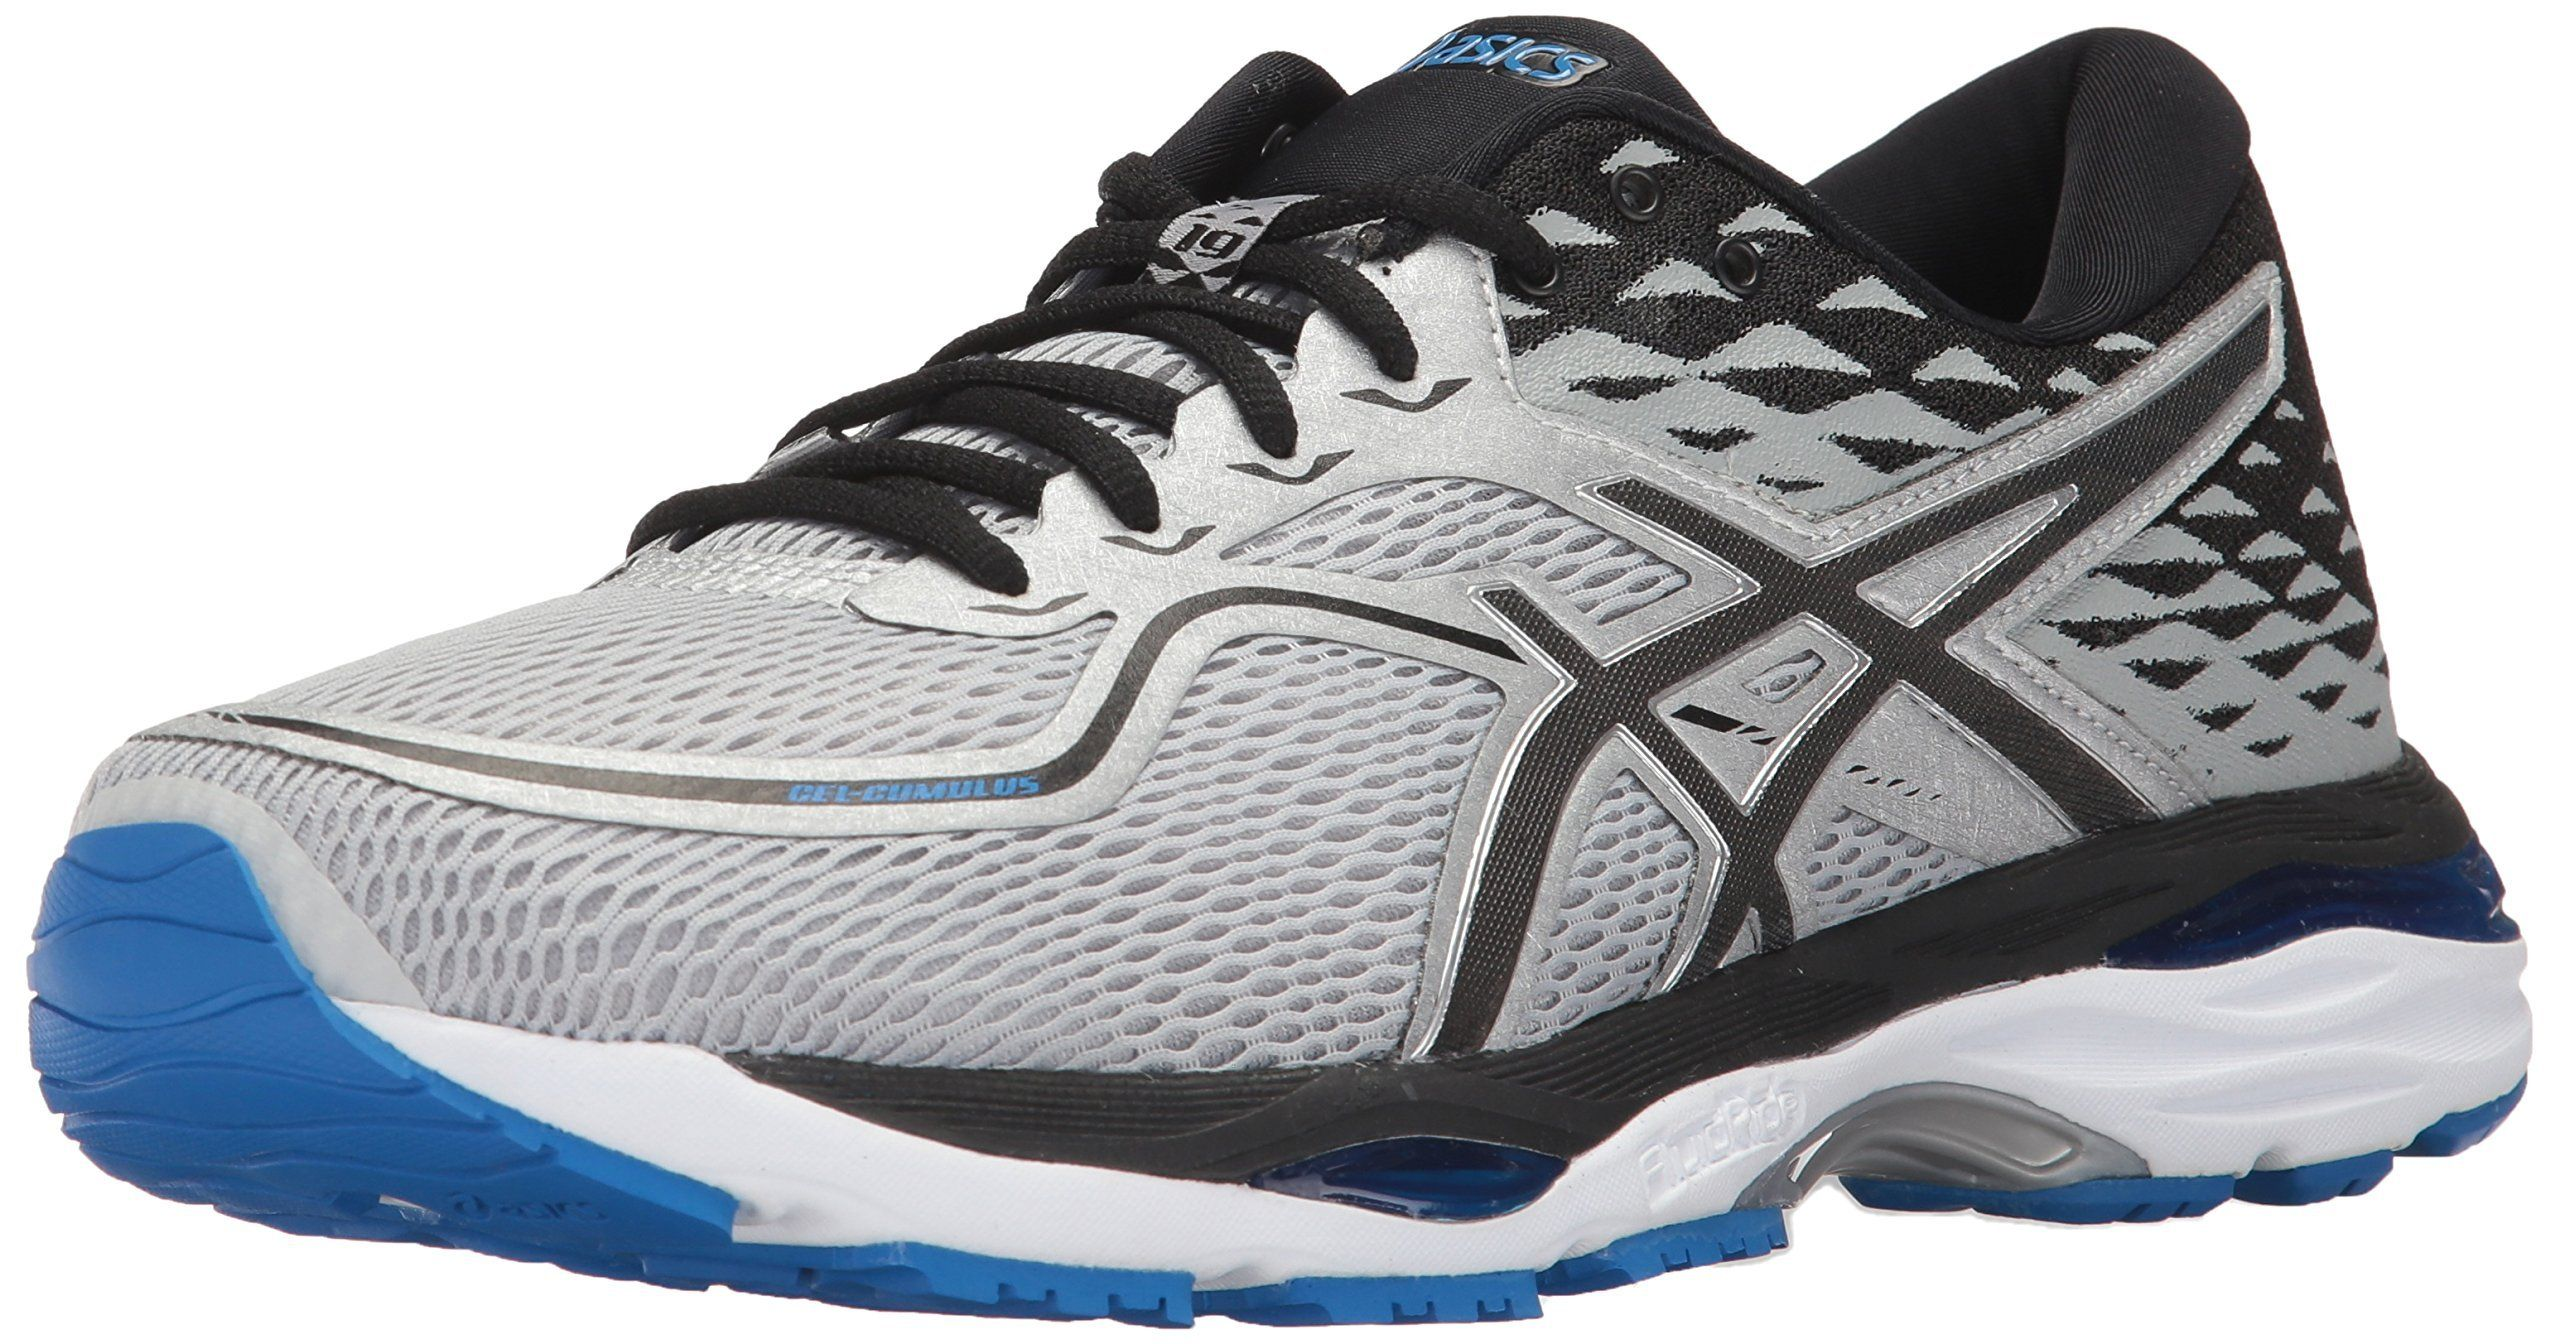 ASICS Mens Gel Cumulus 19 Running Shoe | Running shoes for